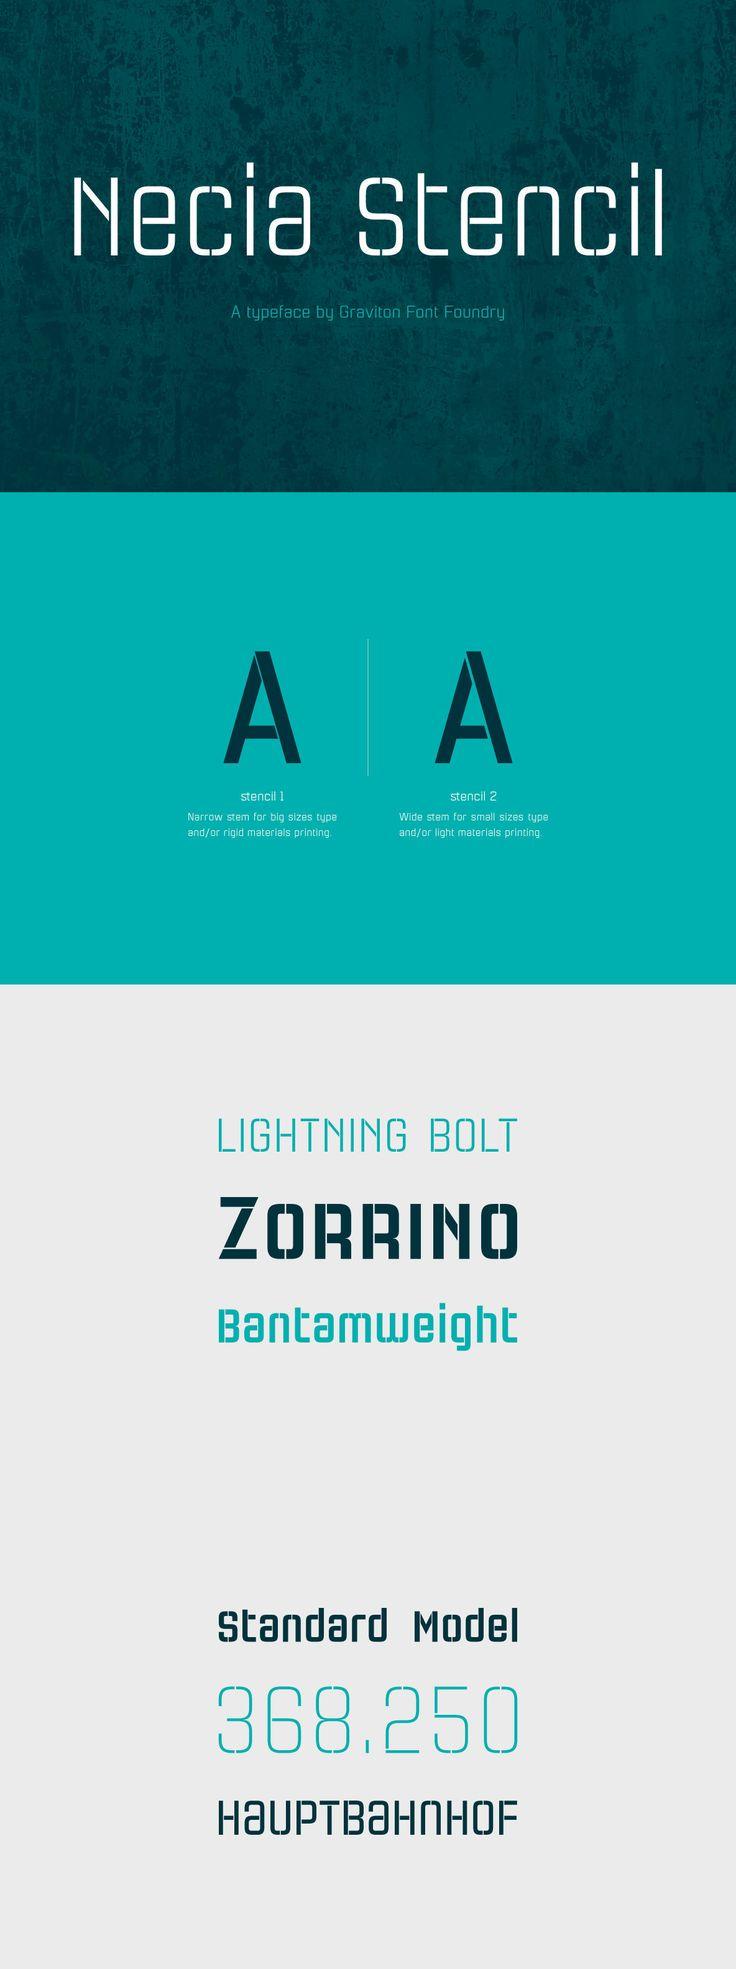 Necia Stencil - Necia Stencil font family is the stencil version of Necia font family, it has been designed for Graviton Font Foundry by Pablo Balcells in 2014.